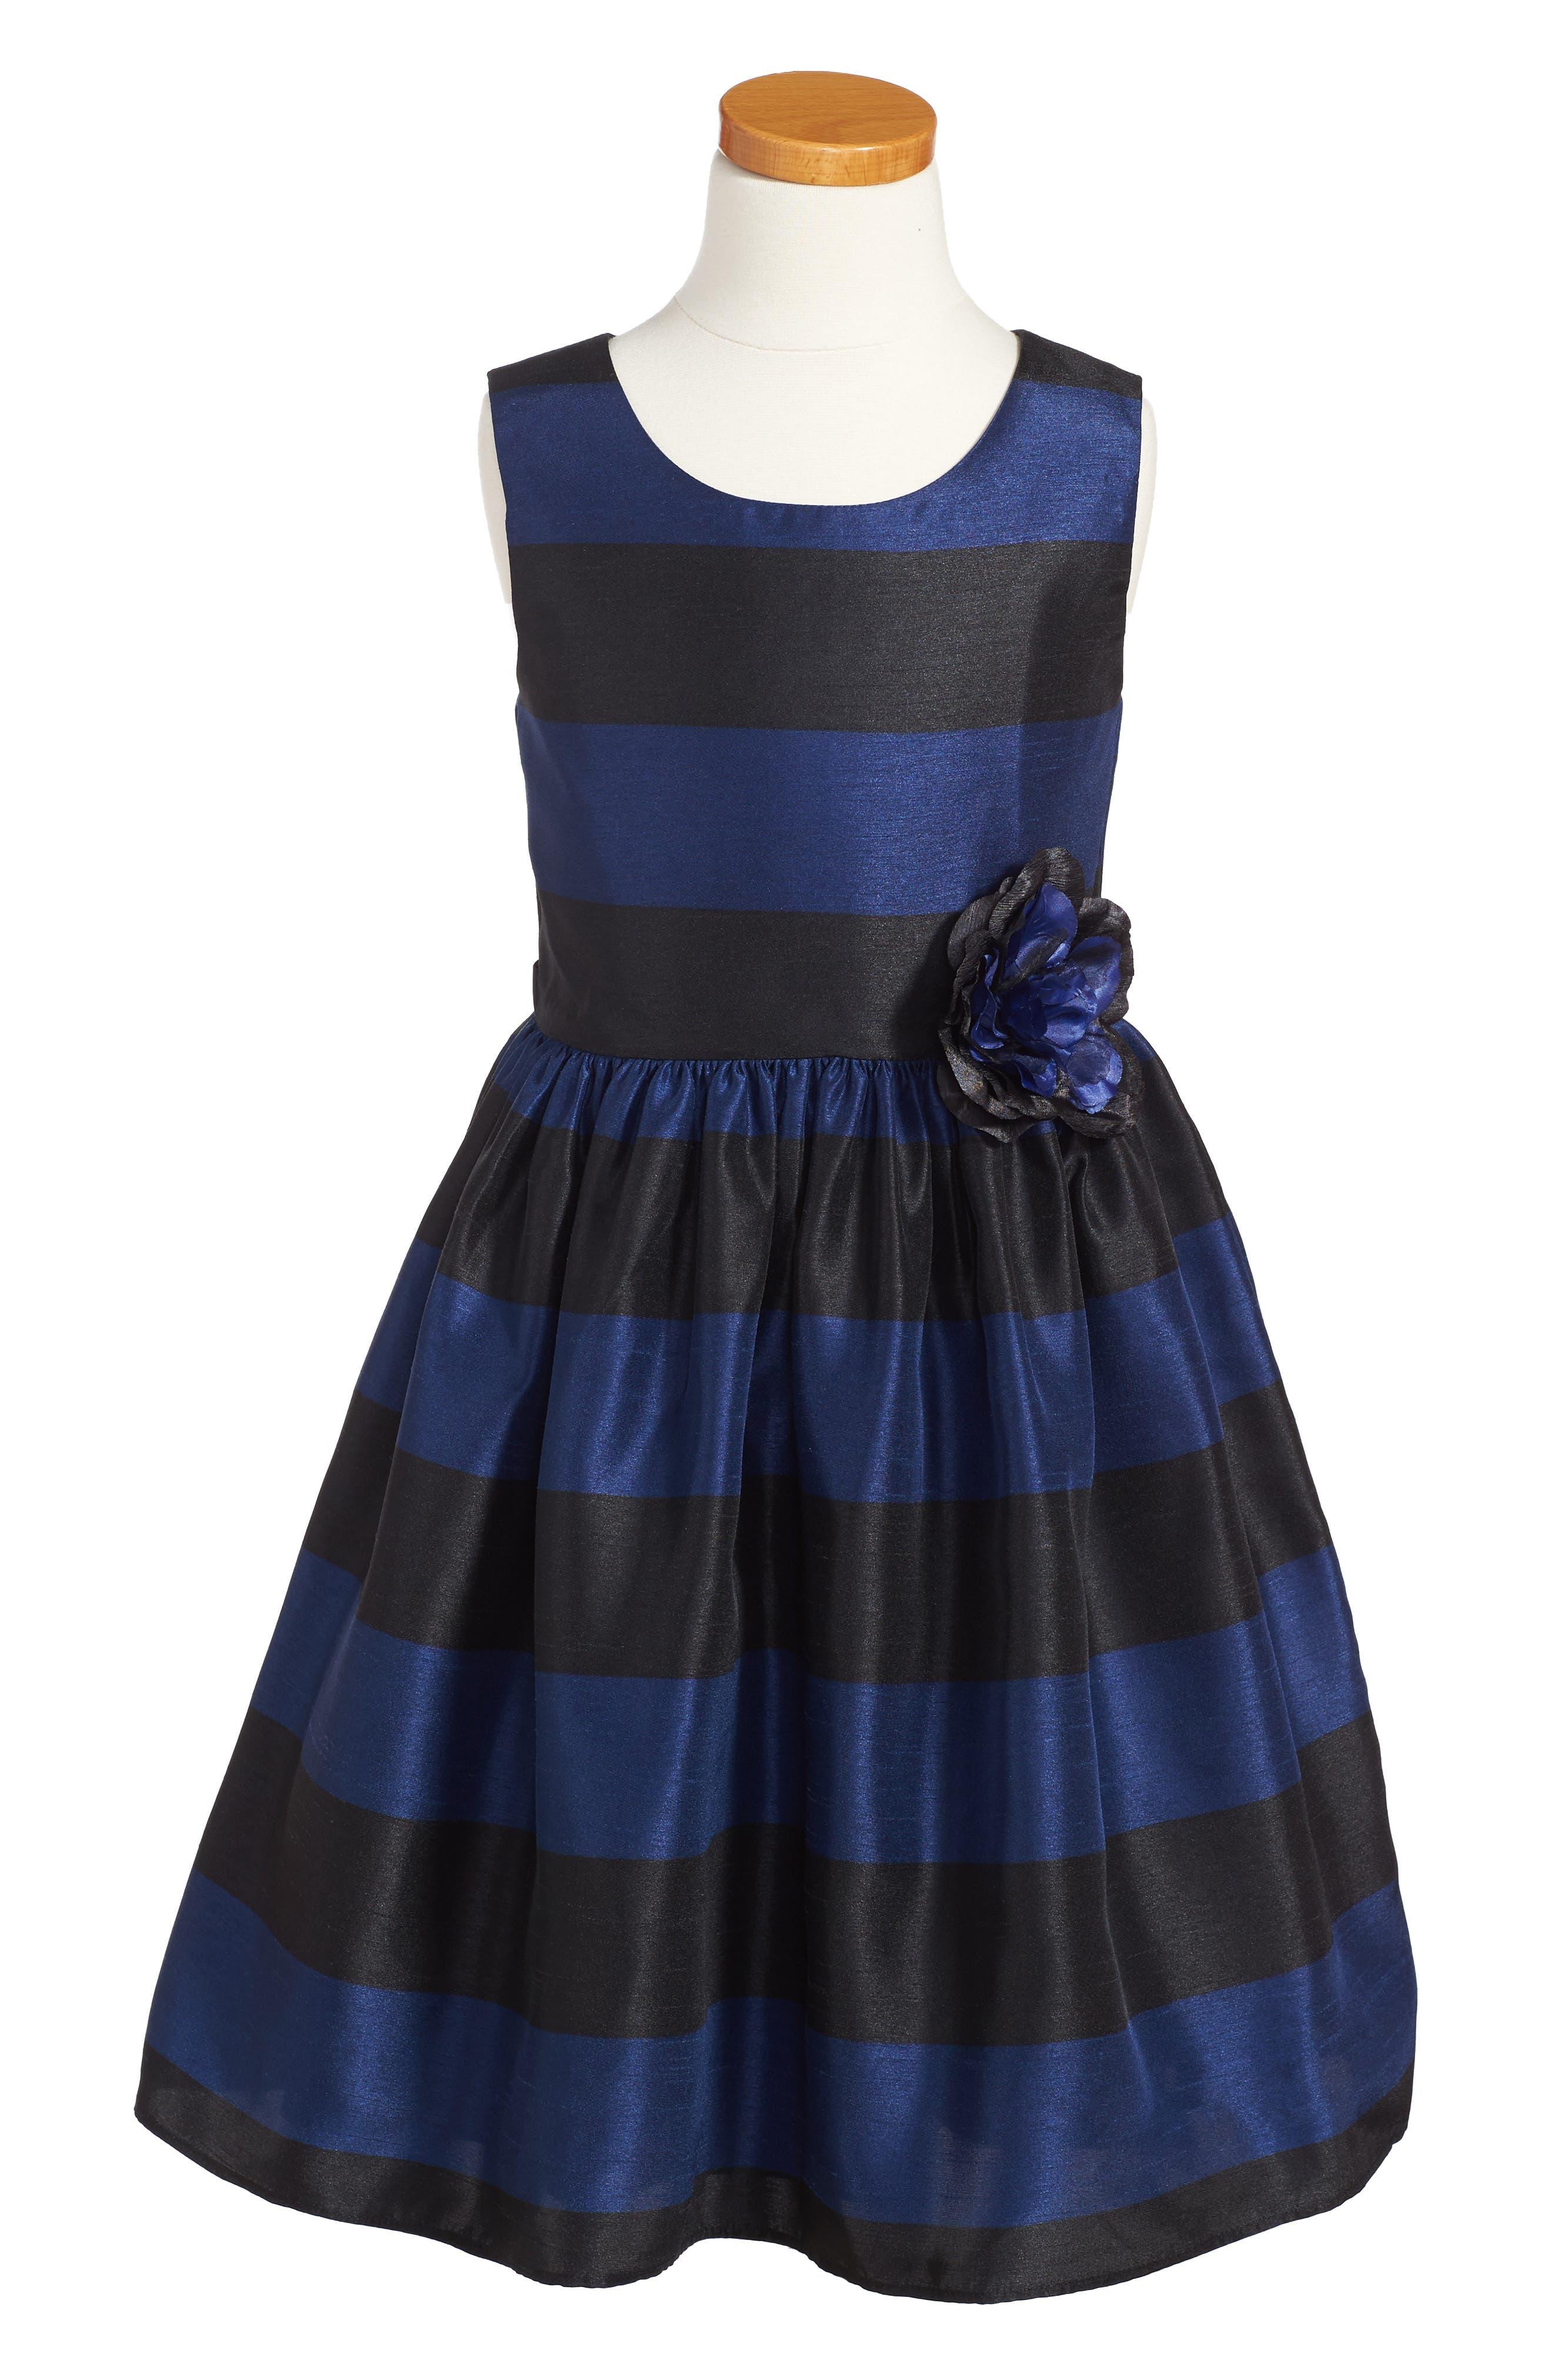 Alternate Image 1 Selected - Frais Stripe Fit & Flare Dress (Toddler Girls, Little Girls & Big Girls)